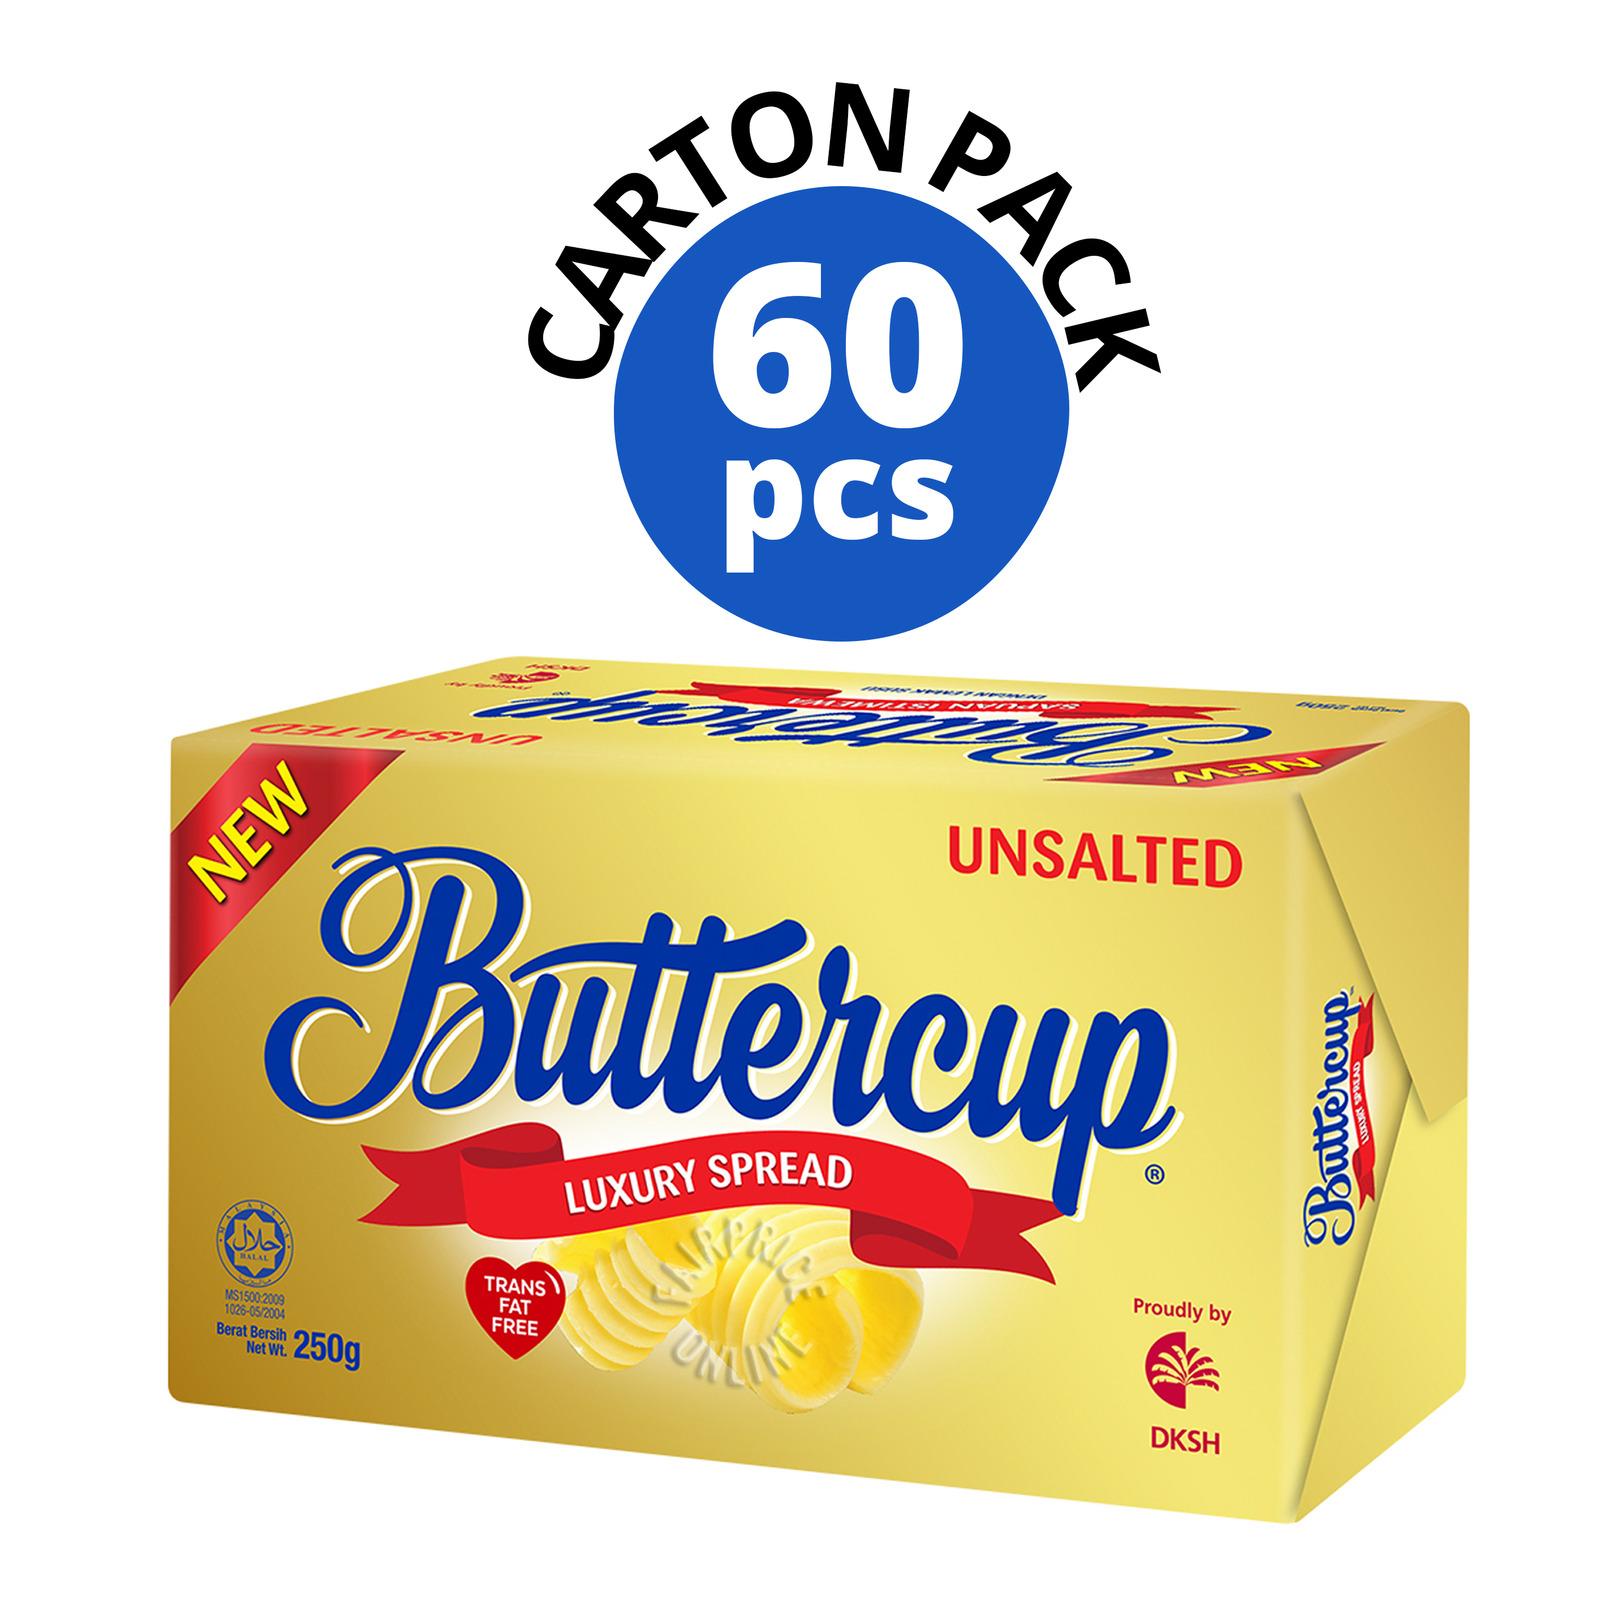 Buttercup Luxury Spread Block - Unsalted